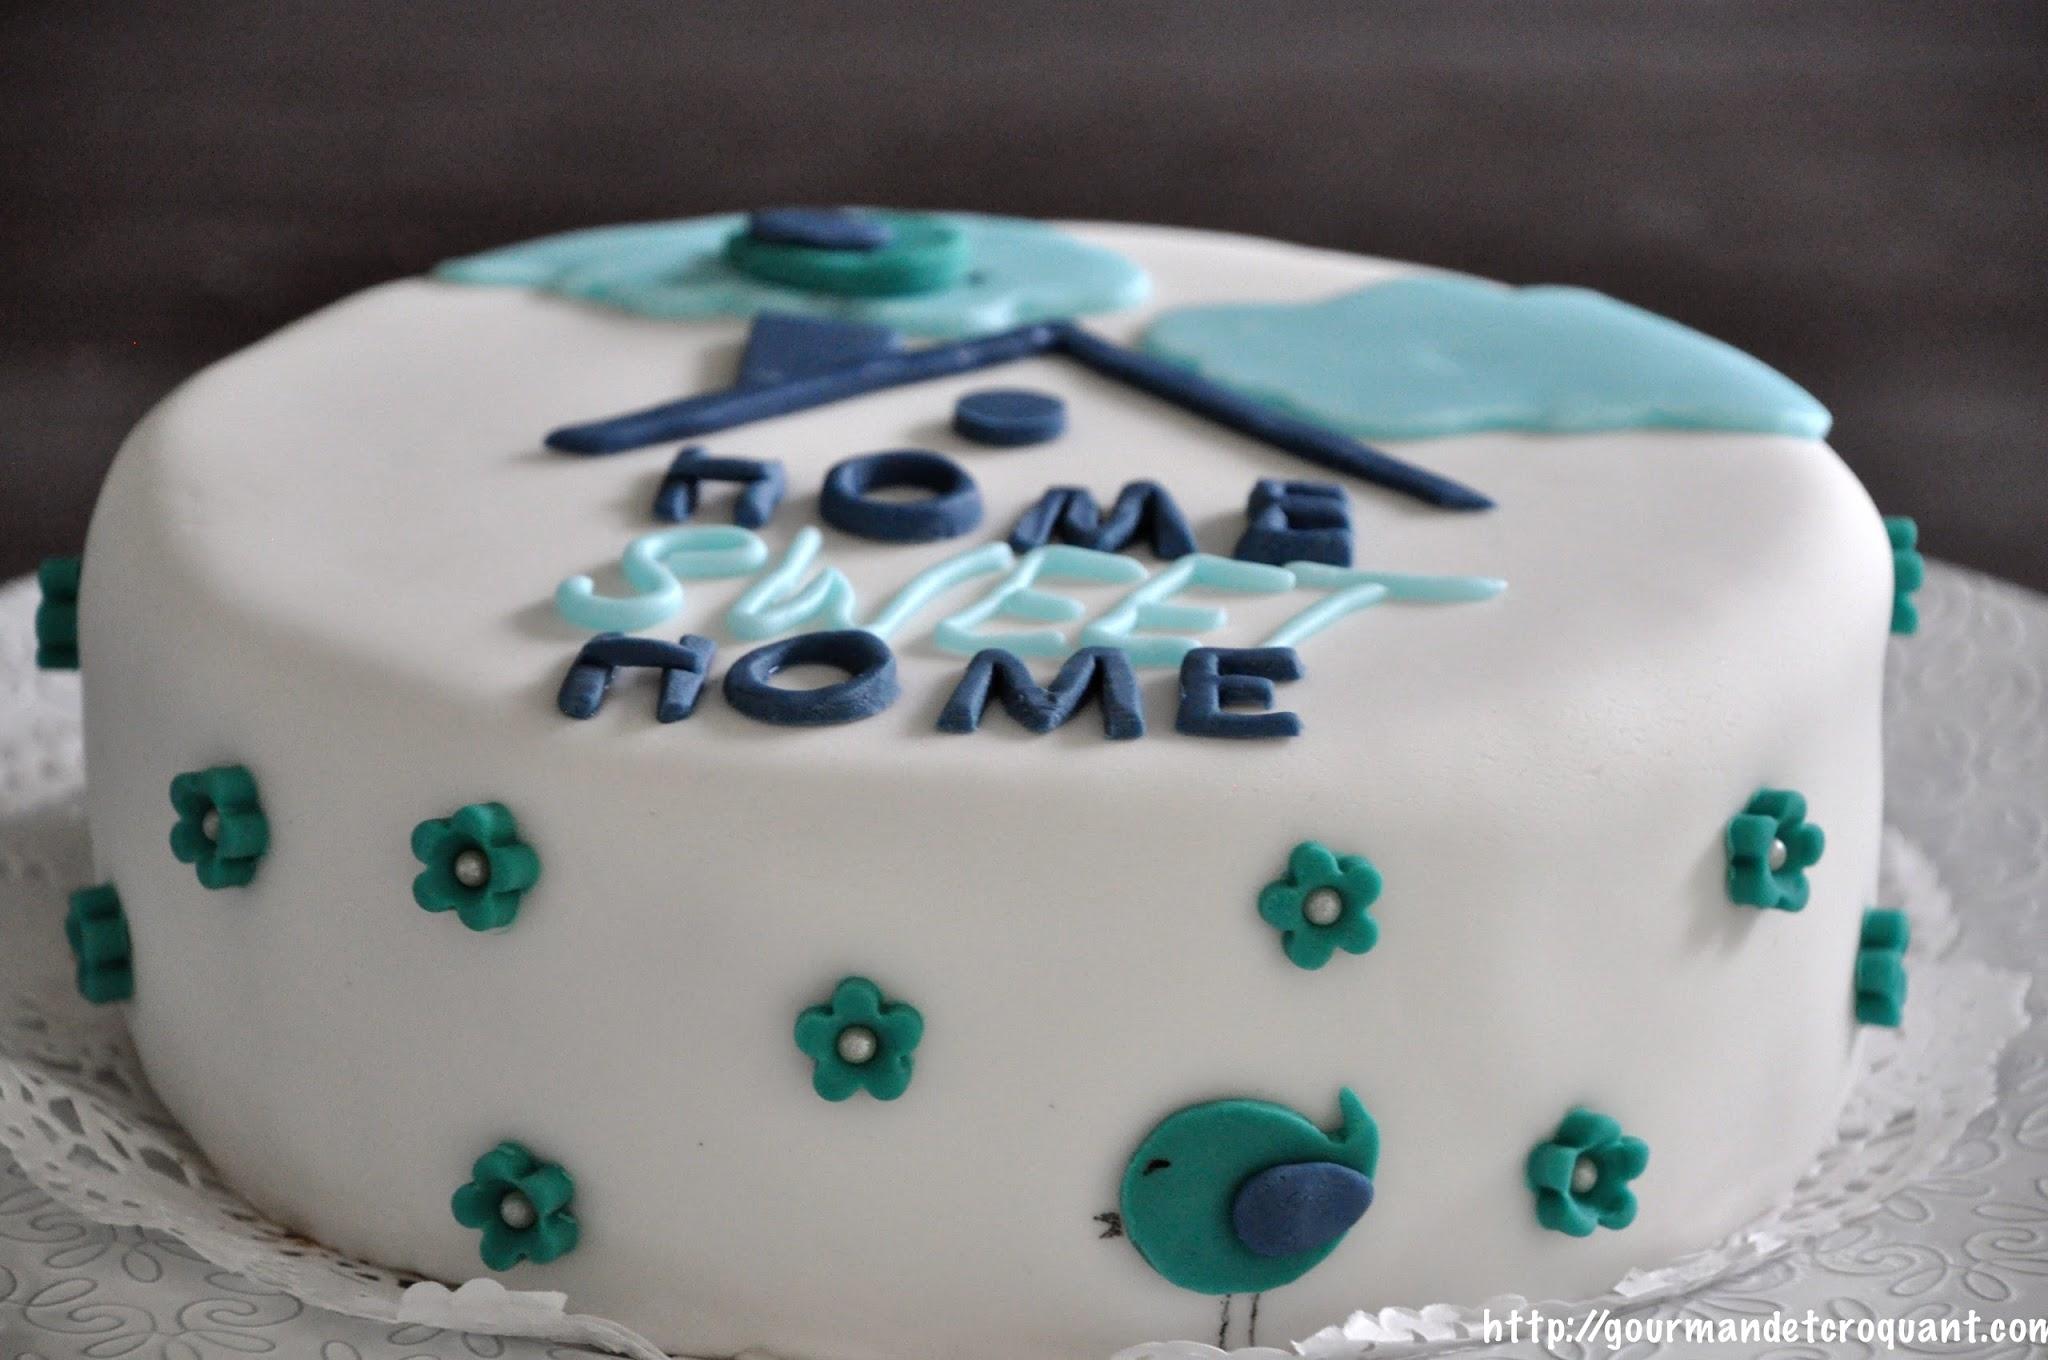 gourmand et croquant cake design home sweet home